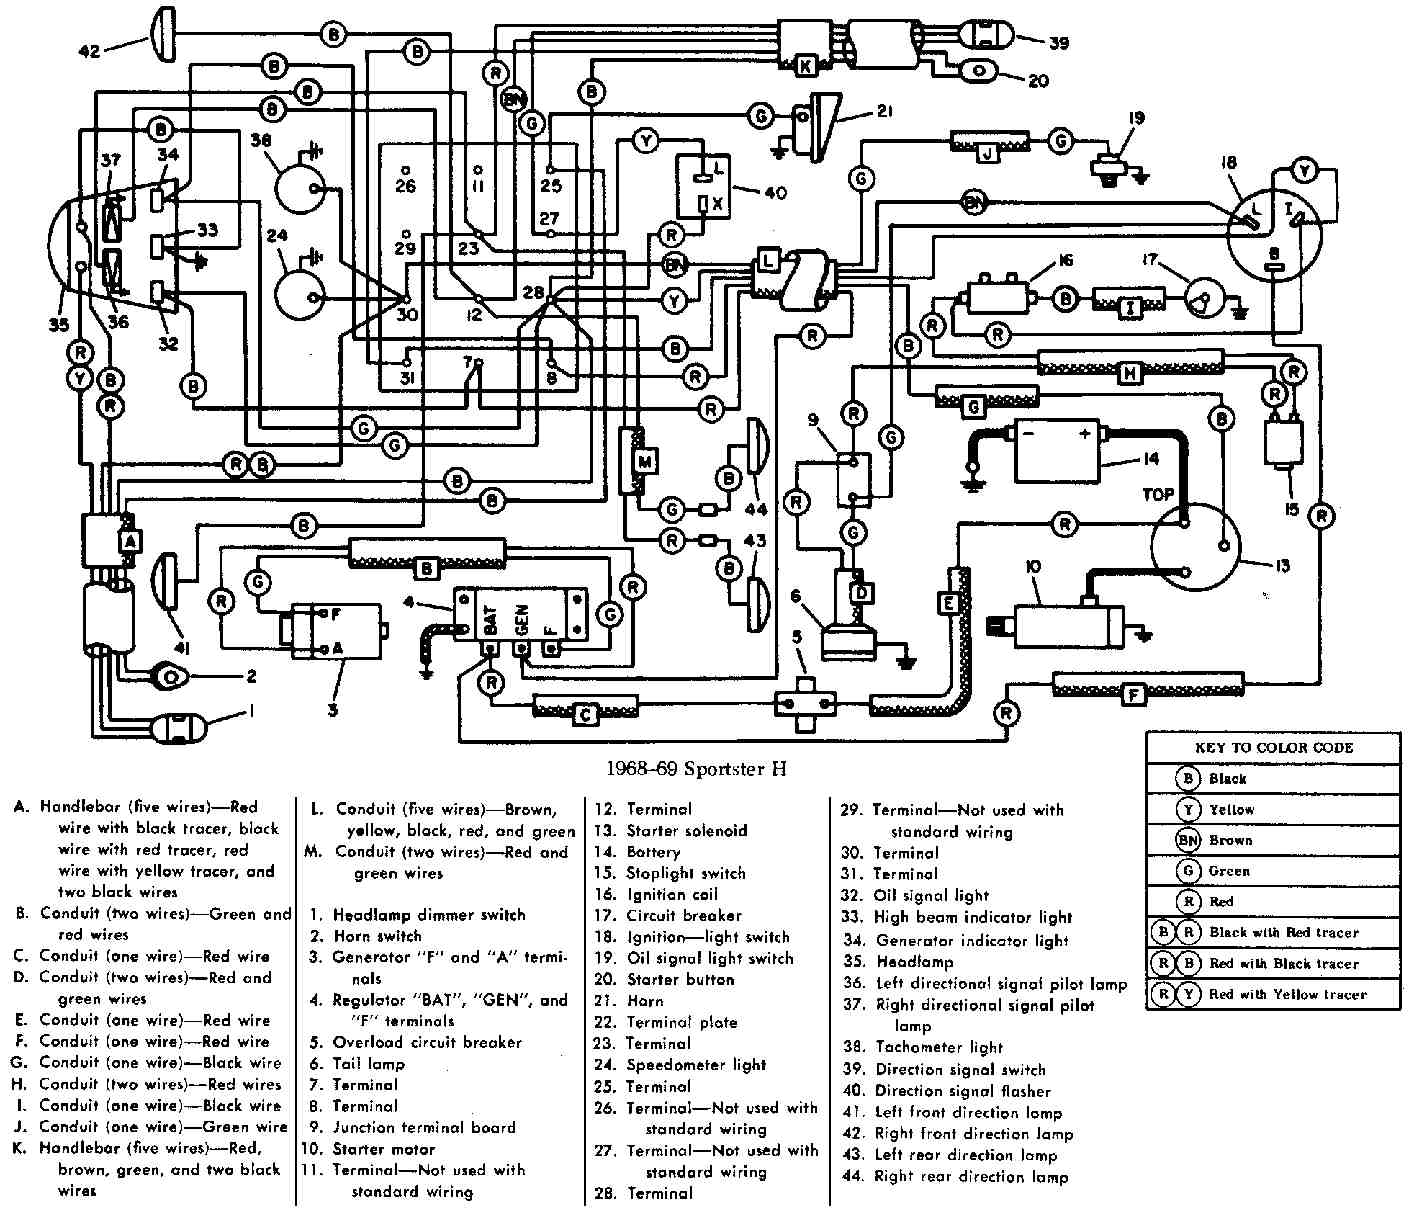 HARLEY DAVIDSON - Motorcycles Manual PDF, Wiring Diagram & Fault Codes | Harley Davidson Wire Diagram 84 |  | Motorcycle Manuals News